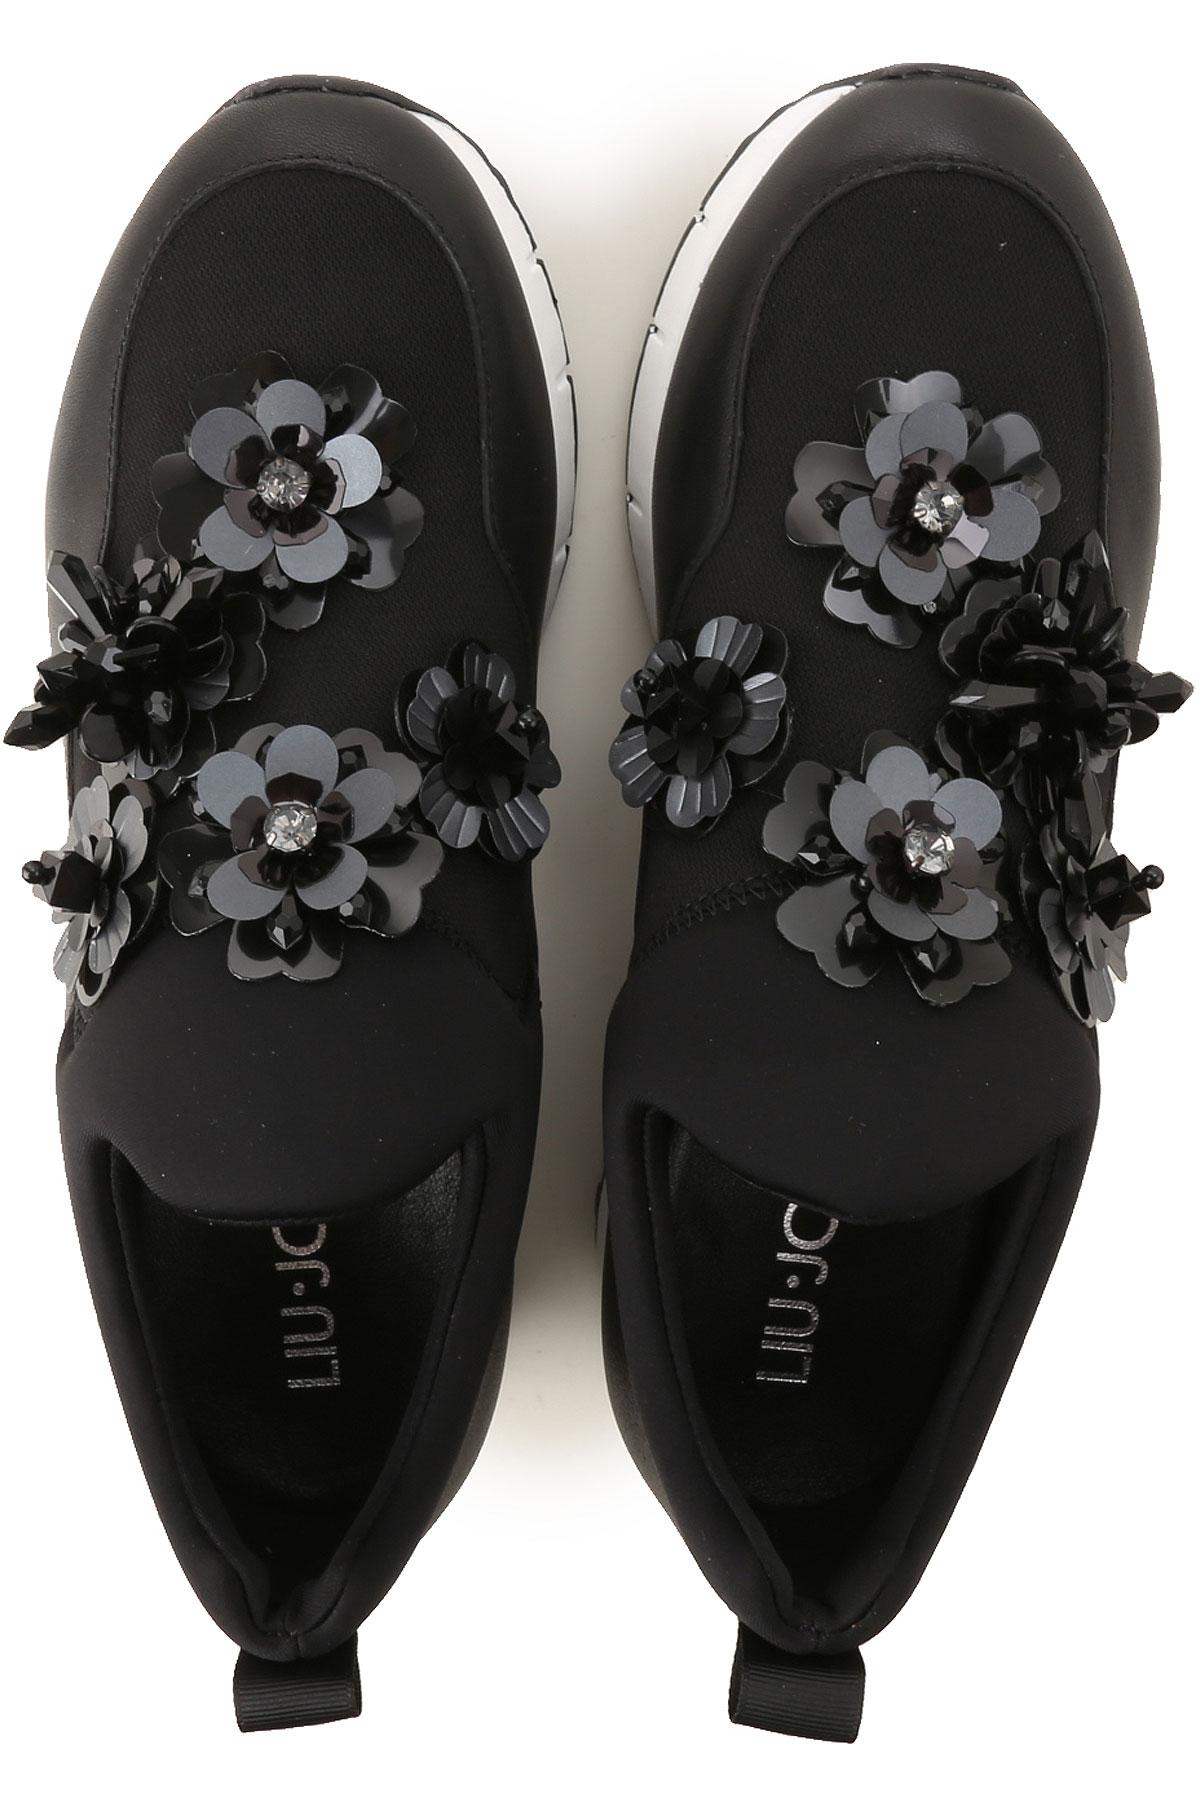 Jo Zapatos Mujer Blanco Para verano Primavera Liu 2019 Negro 61dxpqd